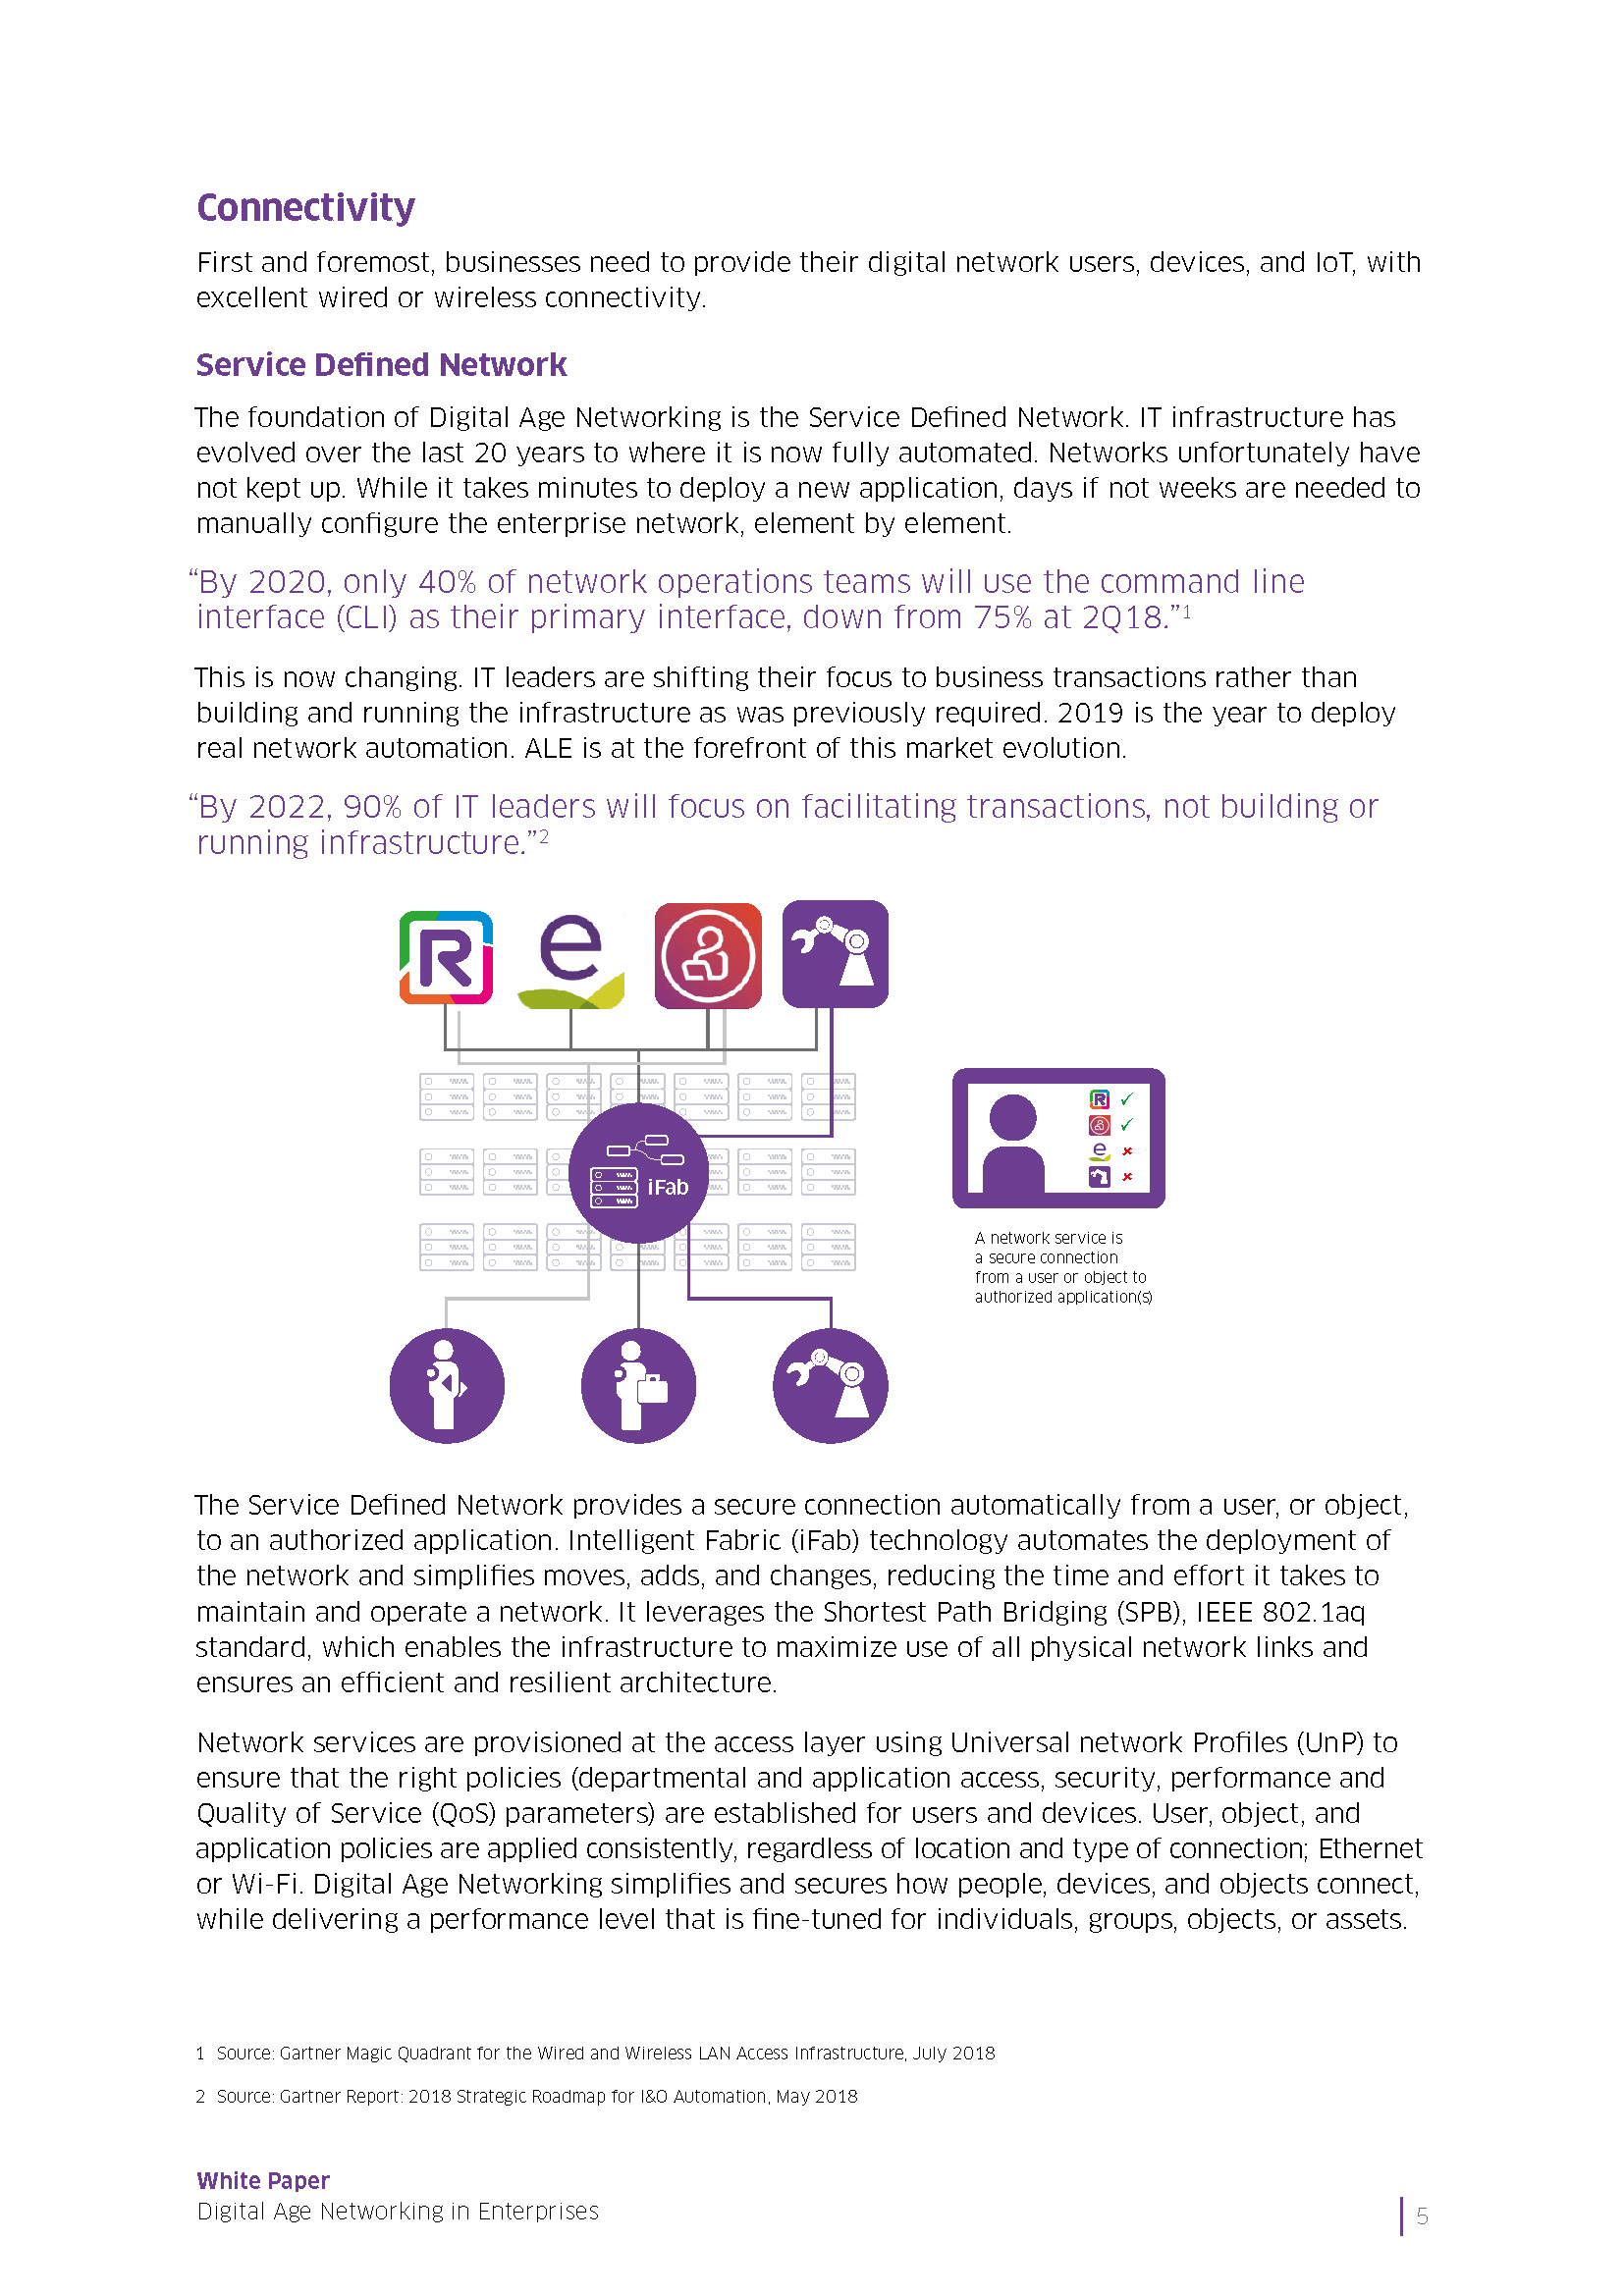 digital-age-networking-enterprises_Page_05